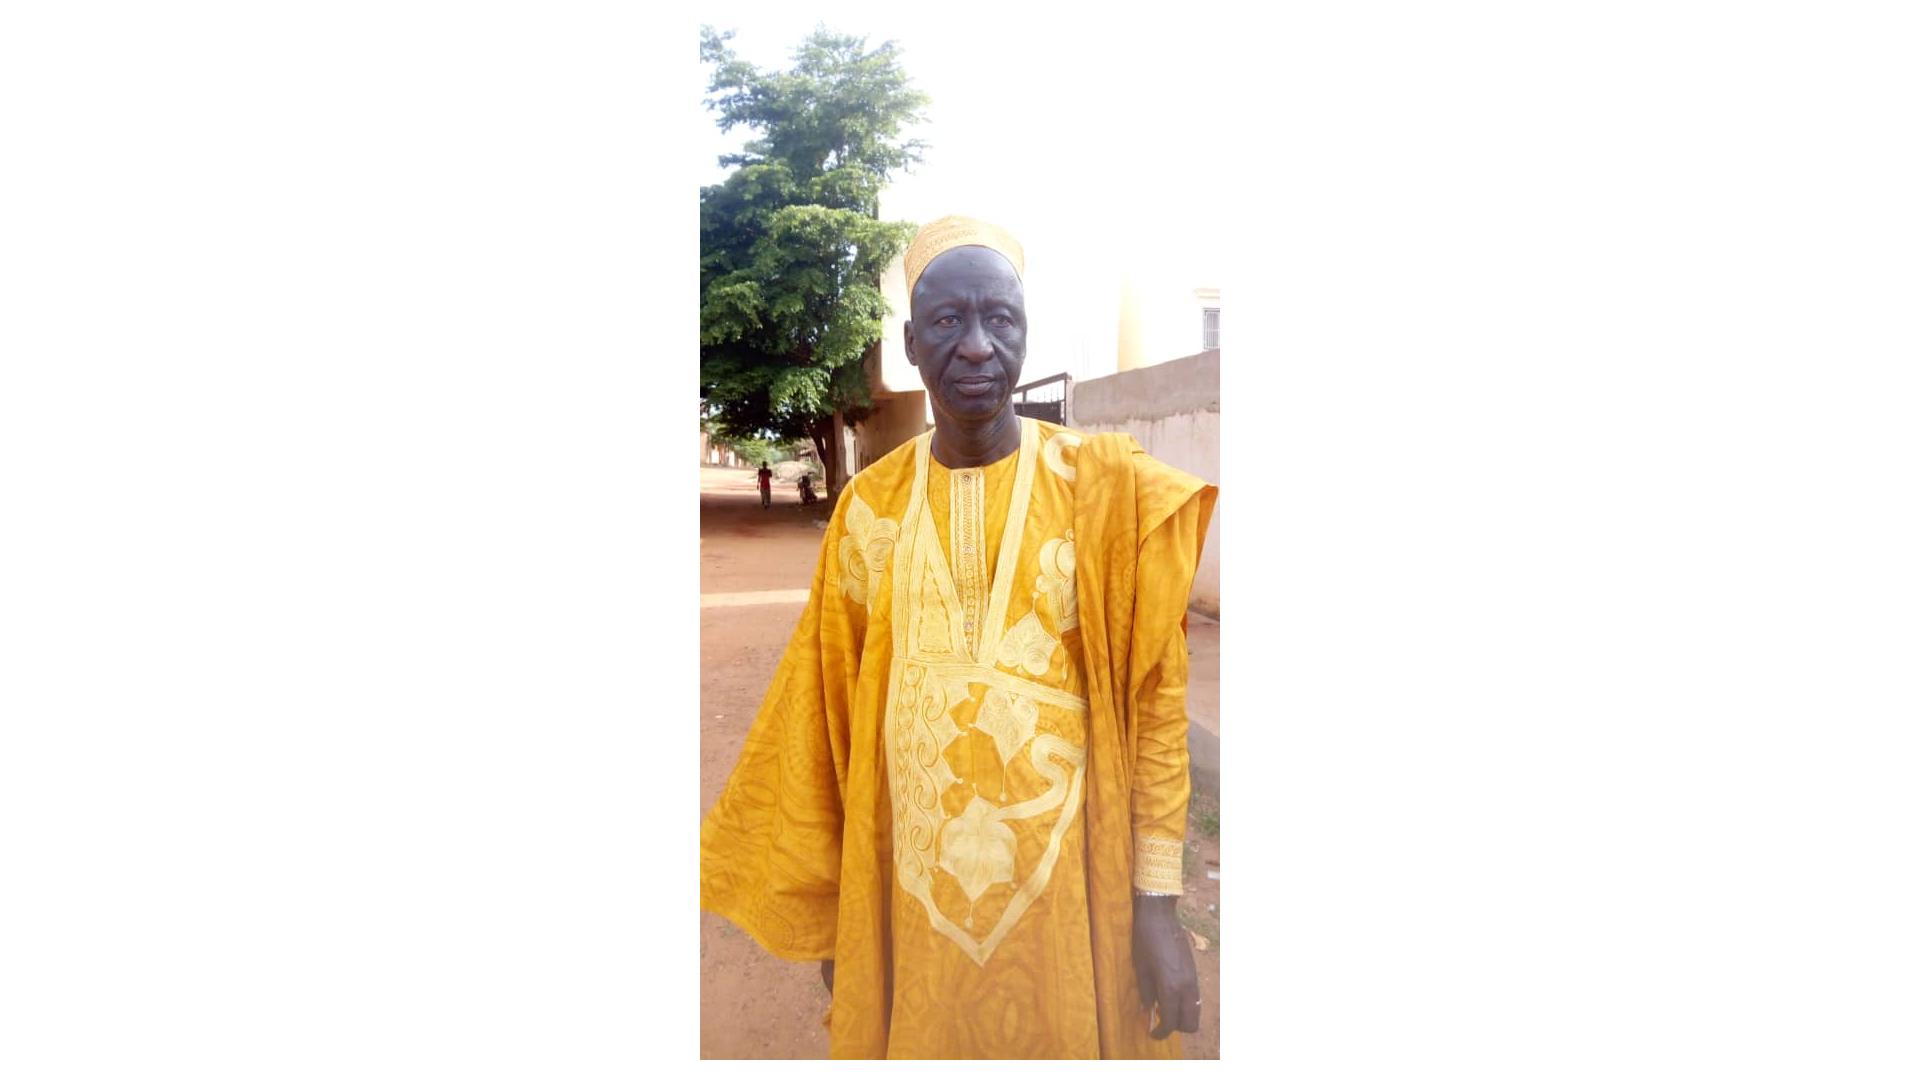 Dokteer Demmba Abubakar Pamanta, ɗemɗiyankeejo e winndiyankeejo e ɗemngal Fulfulde